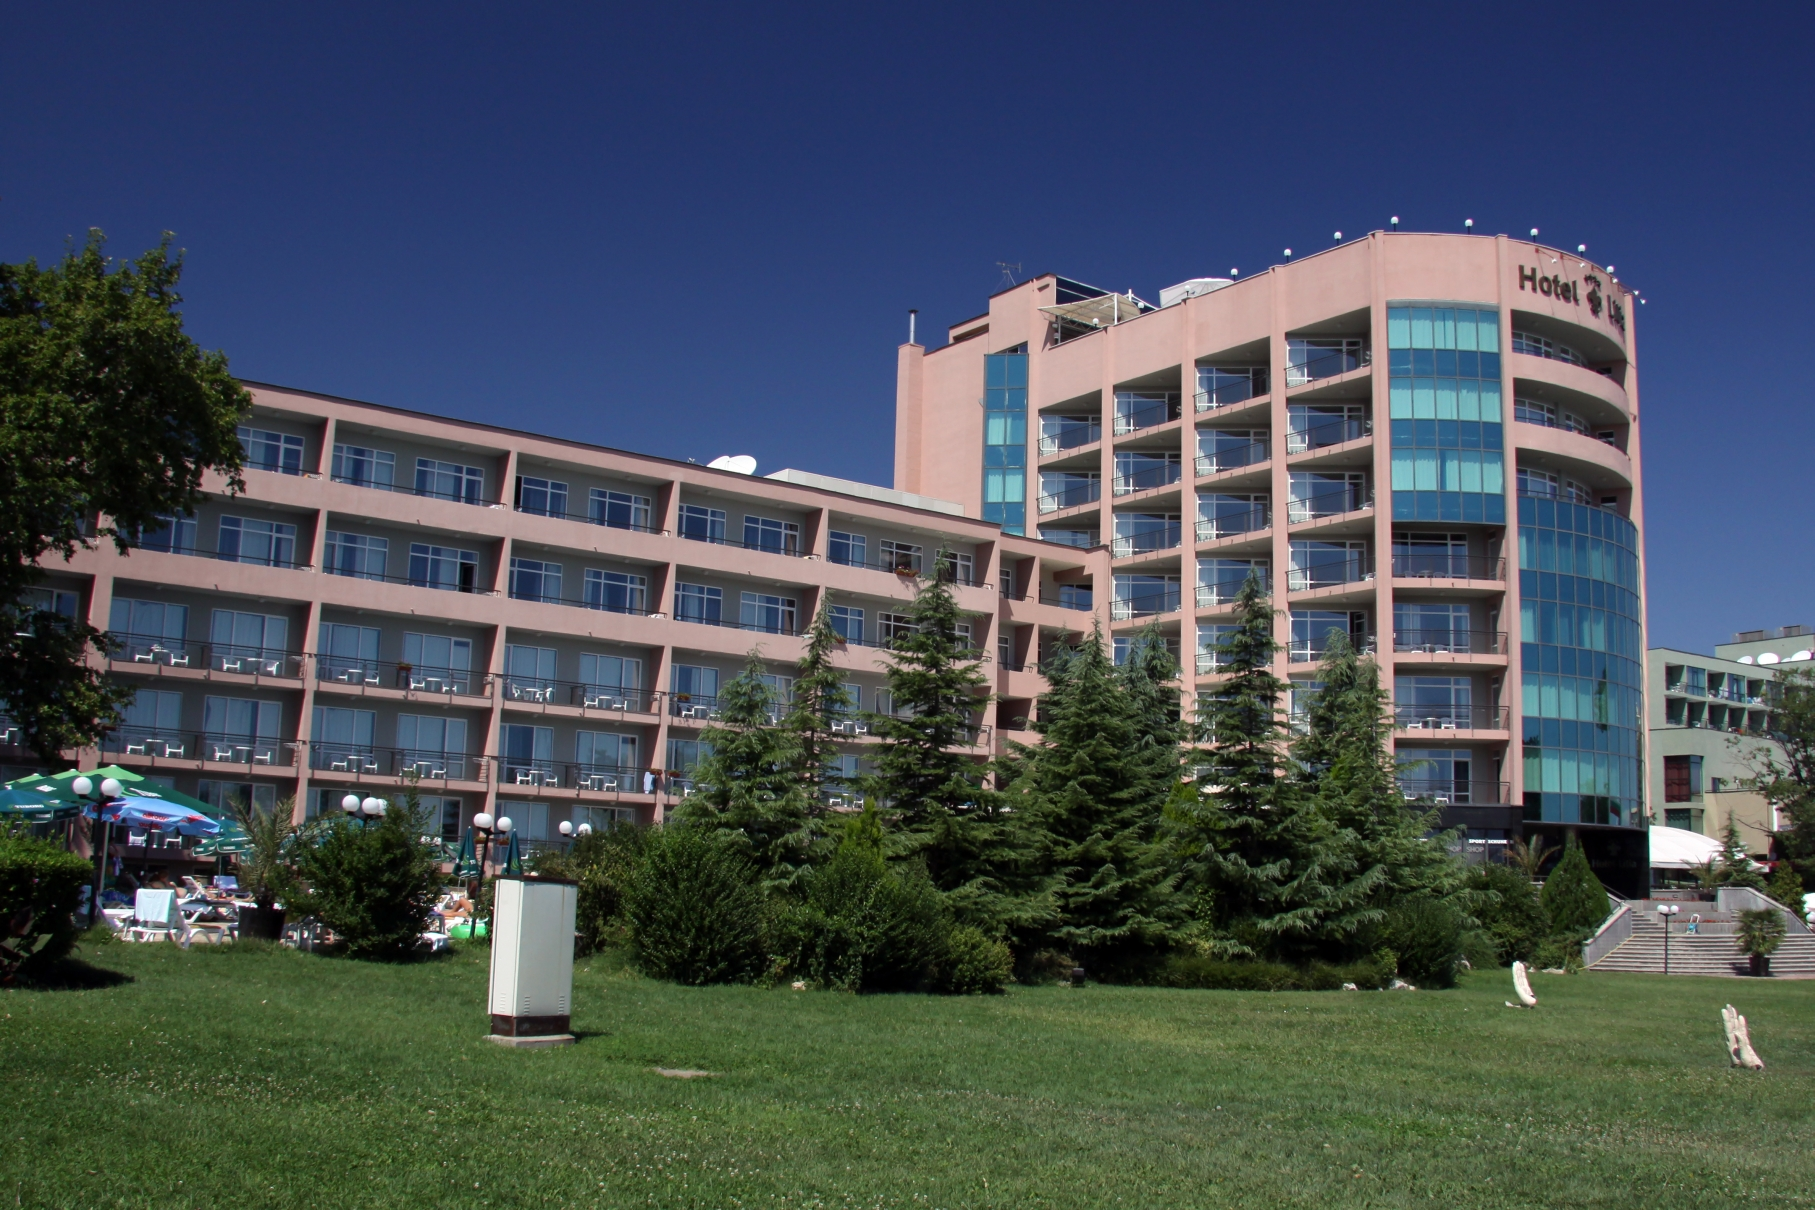 Lilia Hotel, Golden Sands Resort